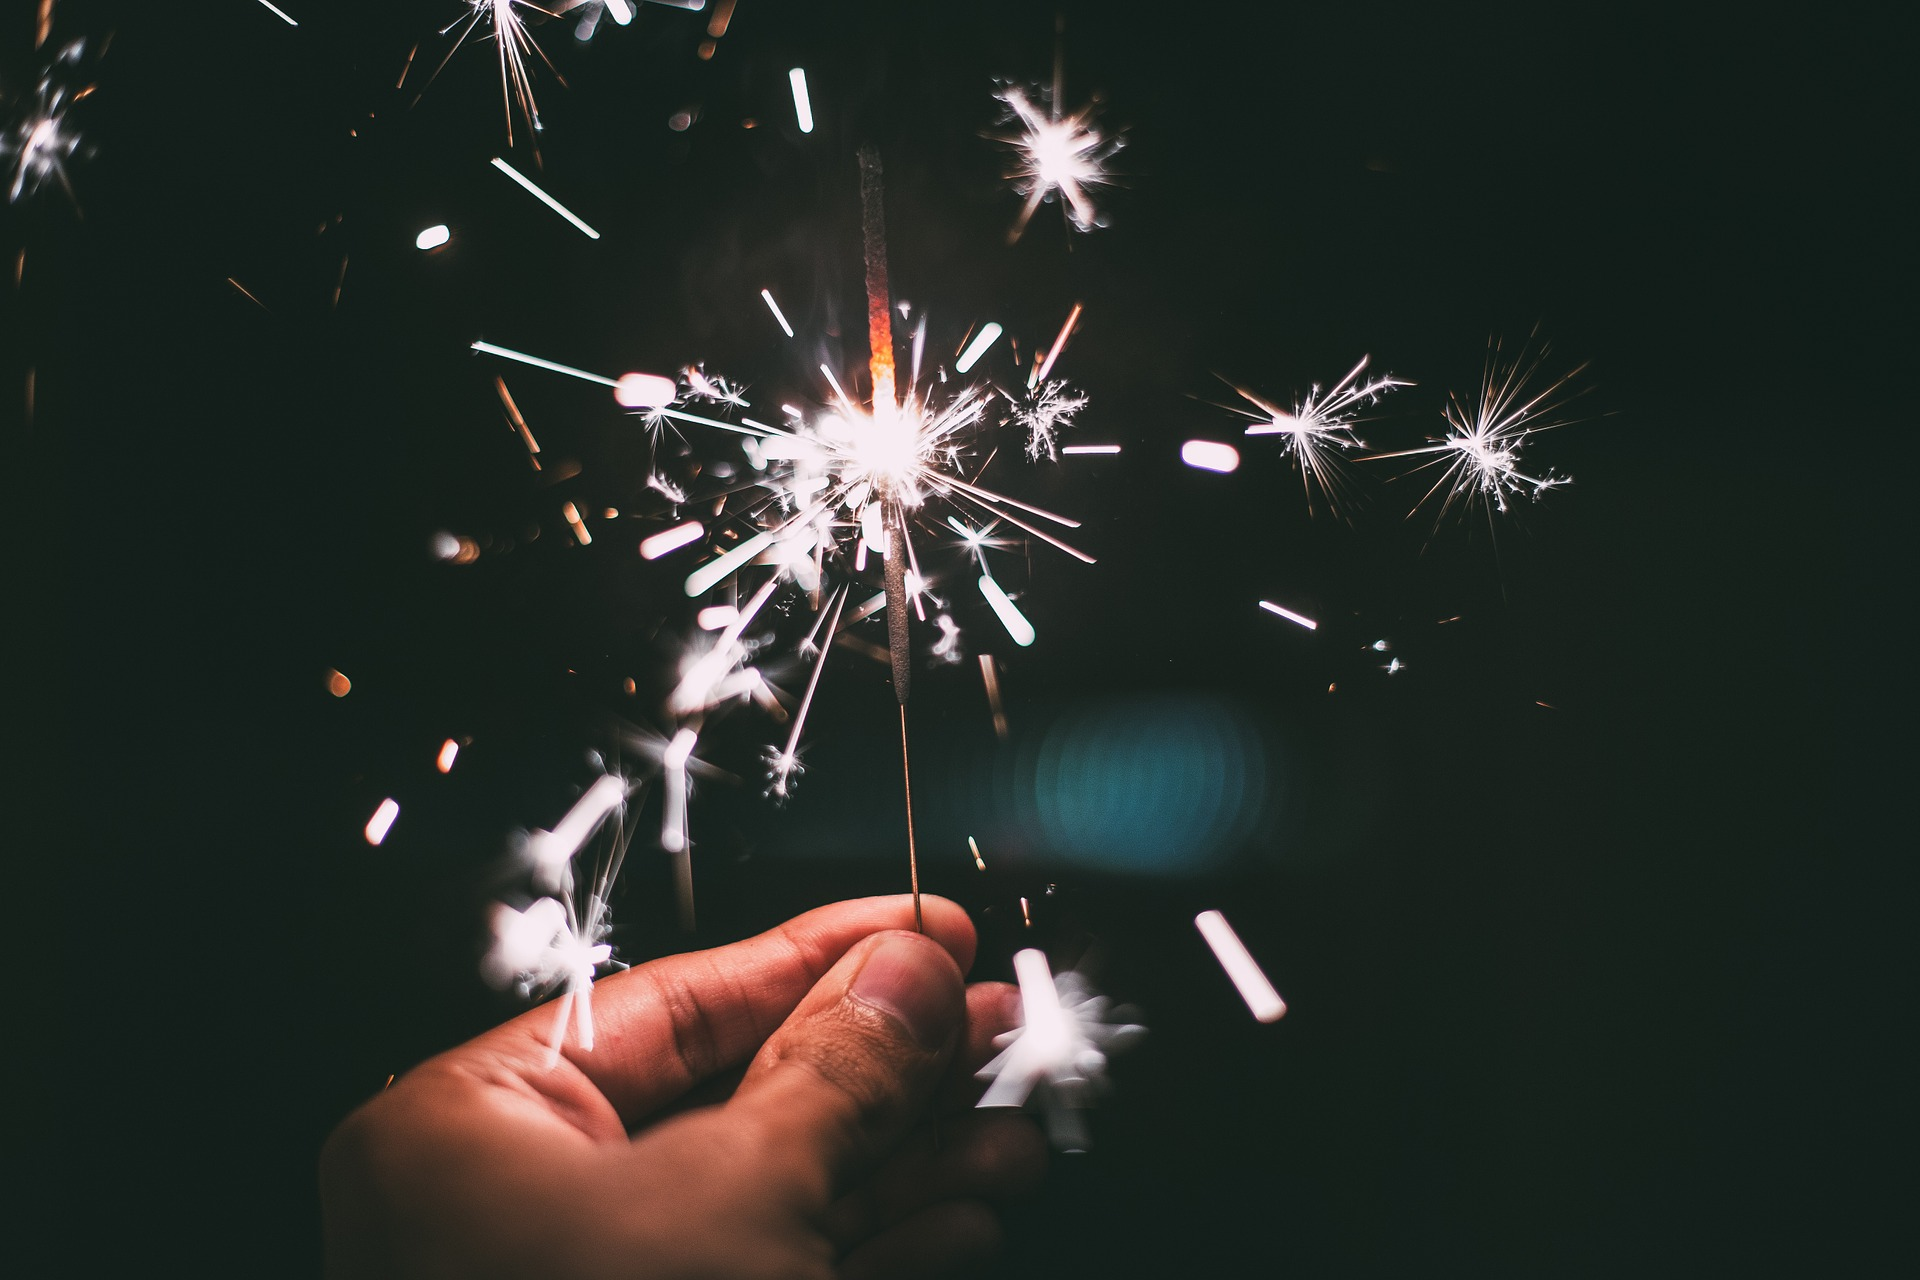 new-years-eve-1283521_1920.jpg